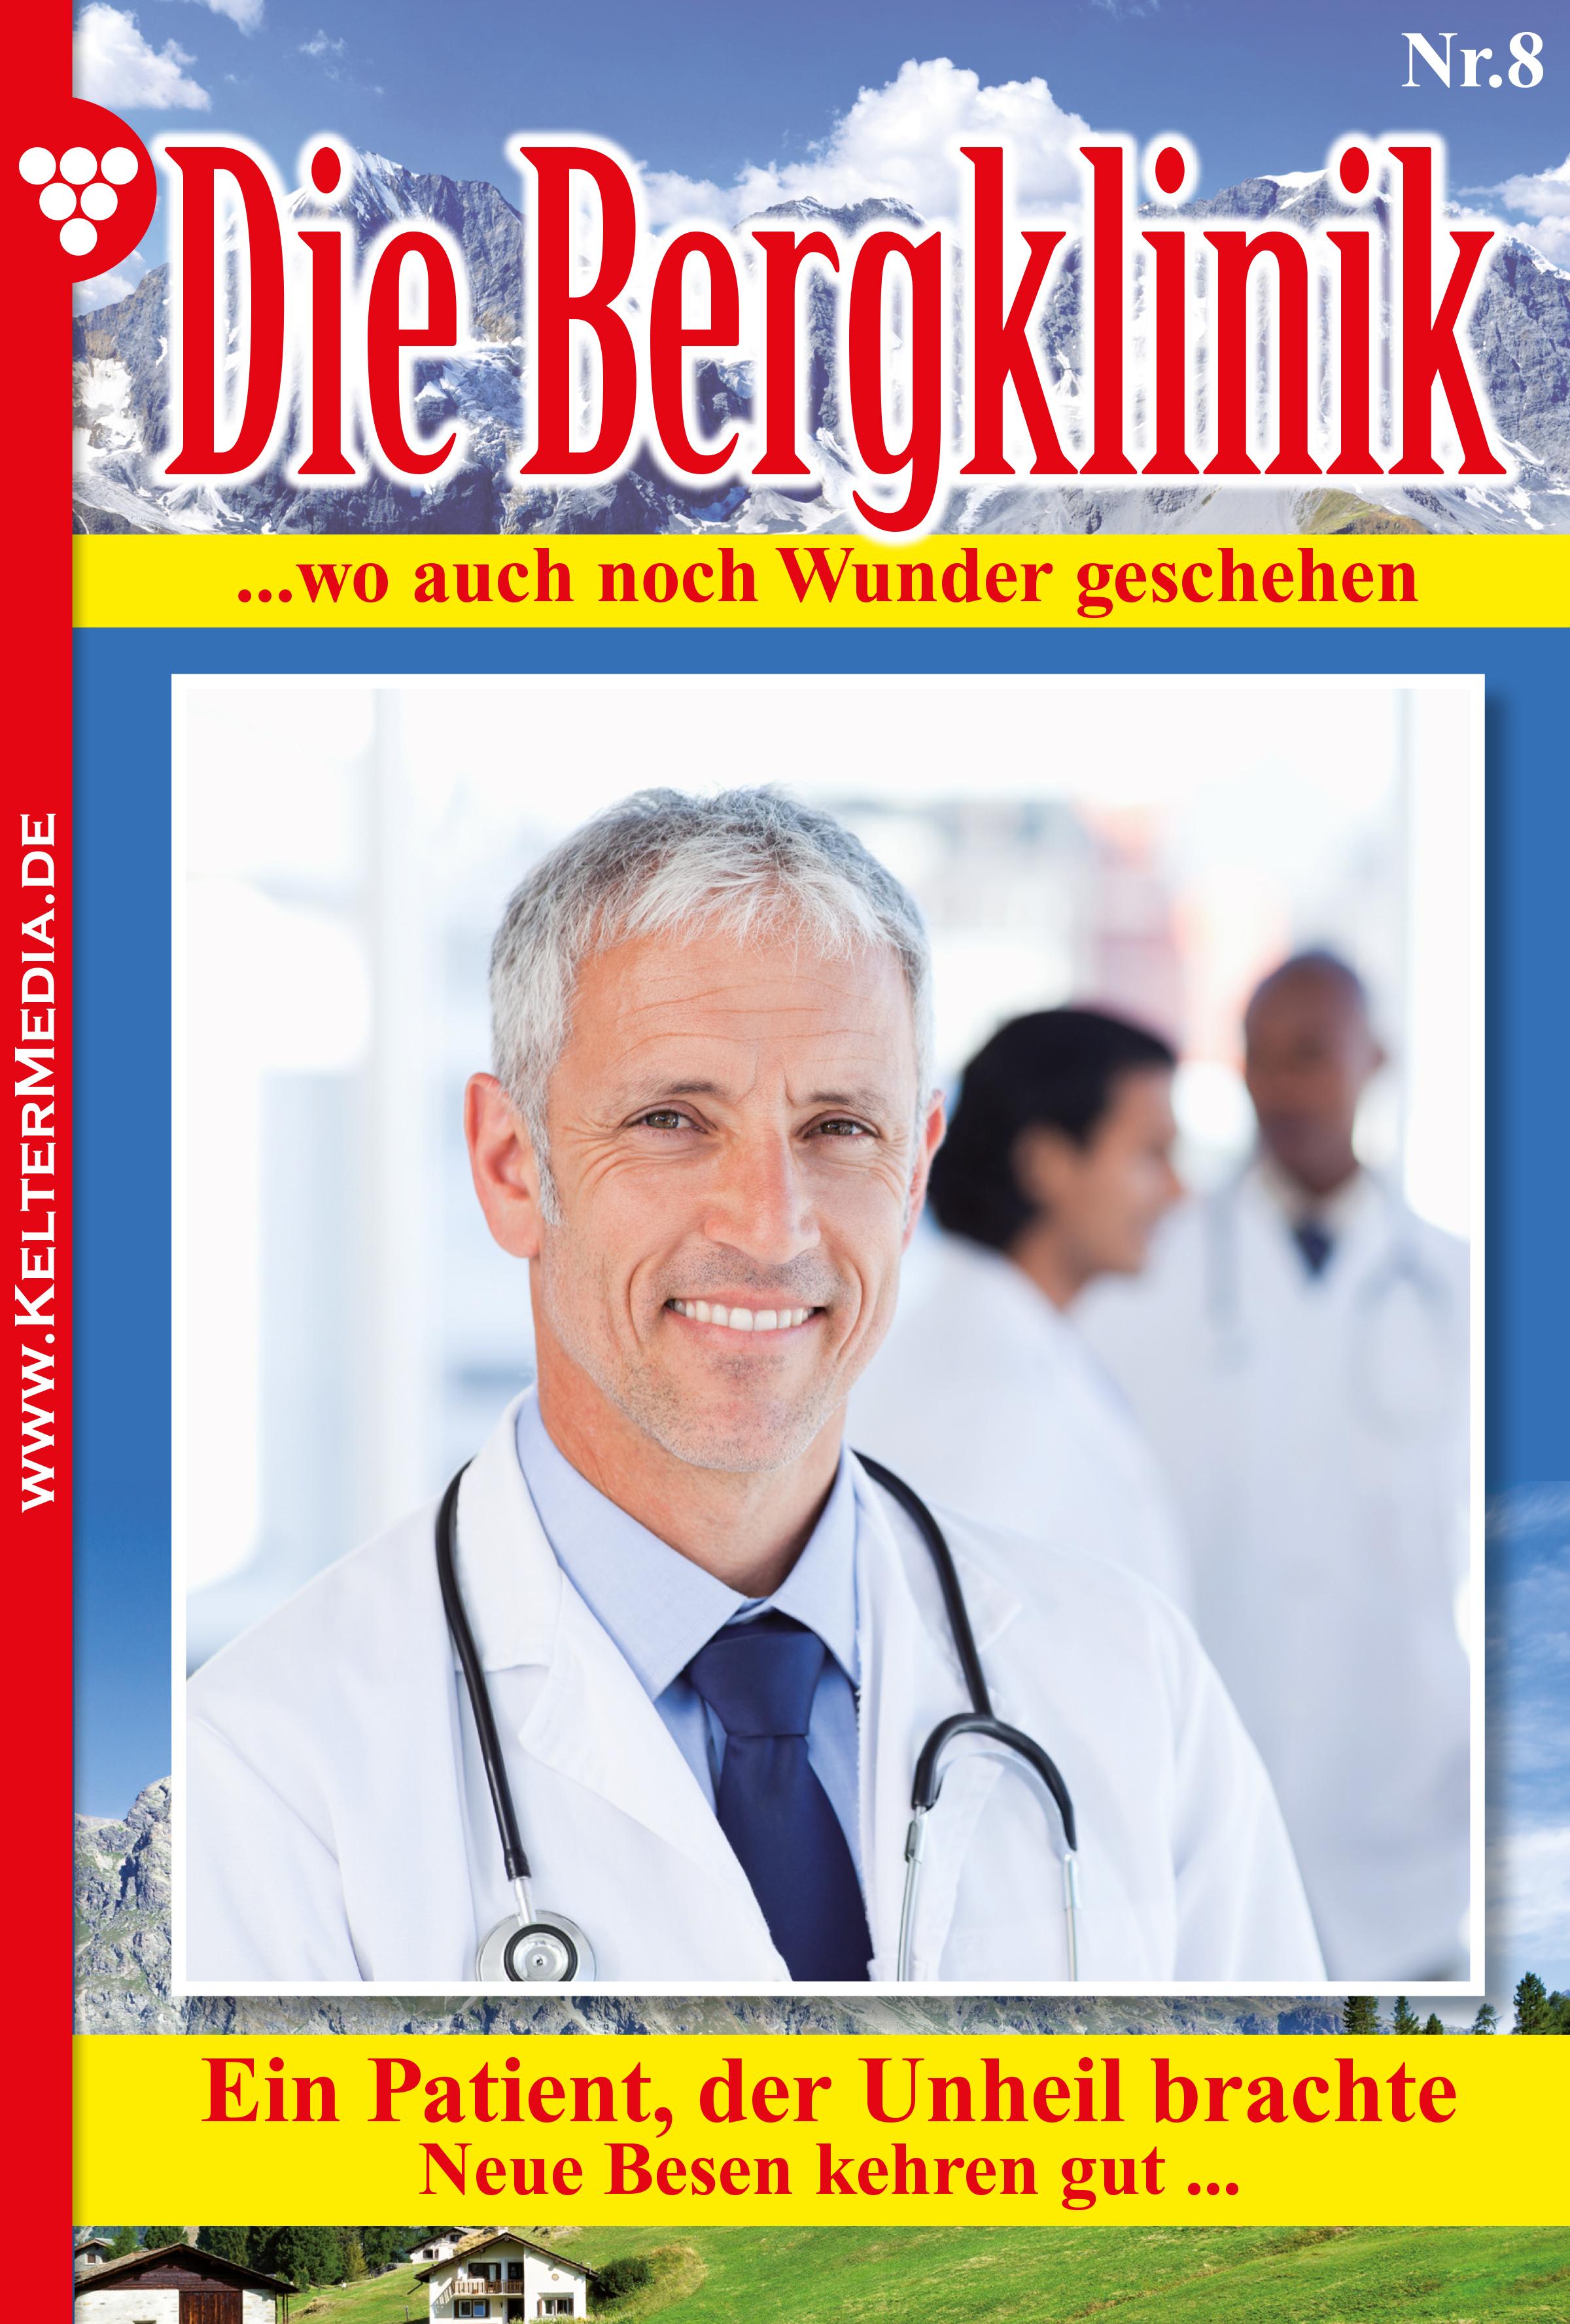 Hans-Peter Lehnert Die Bergklinik 8 – Arztroman hans peter holst den lille hornblaeser et digt danish edition